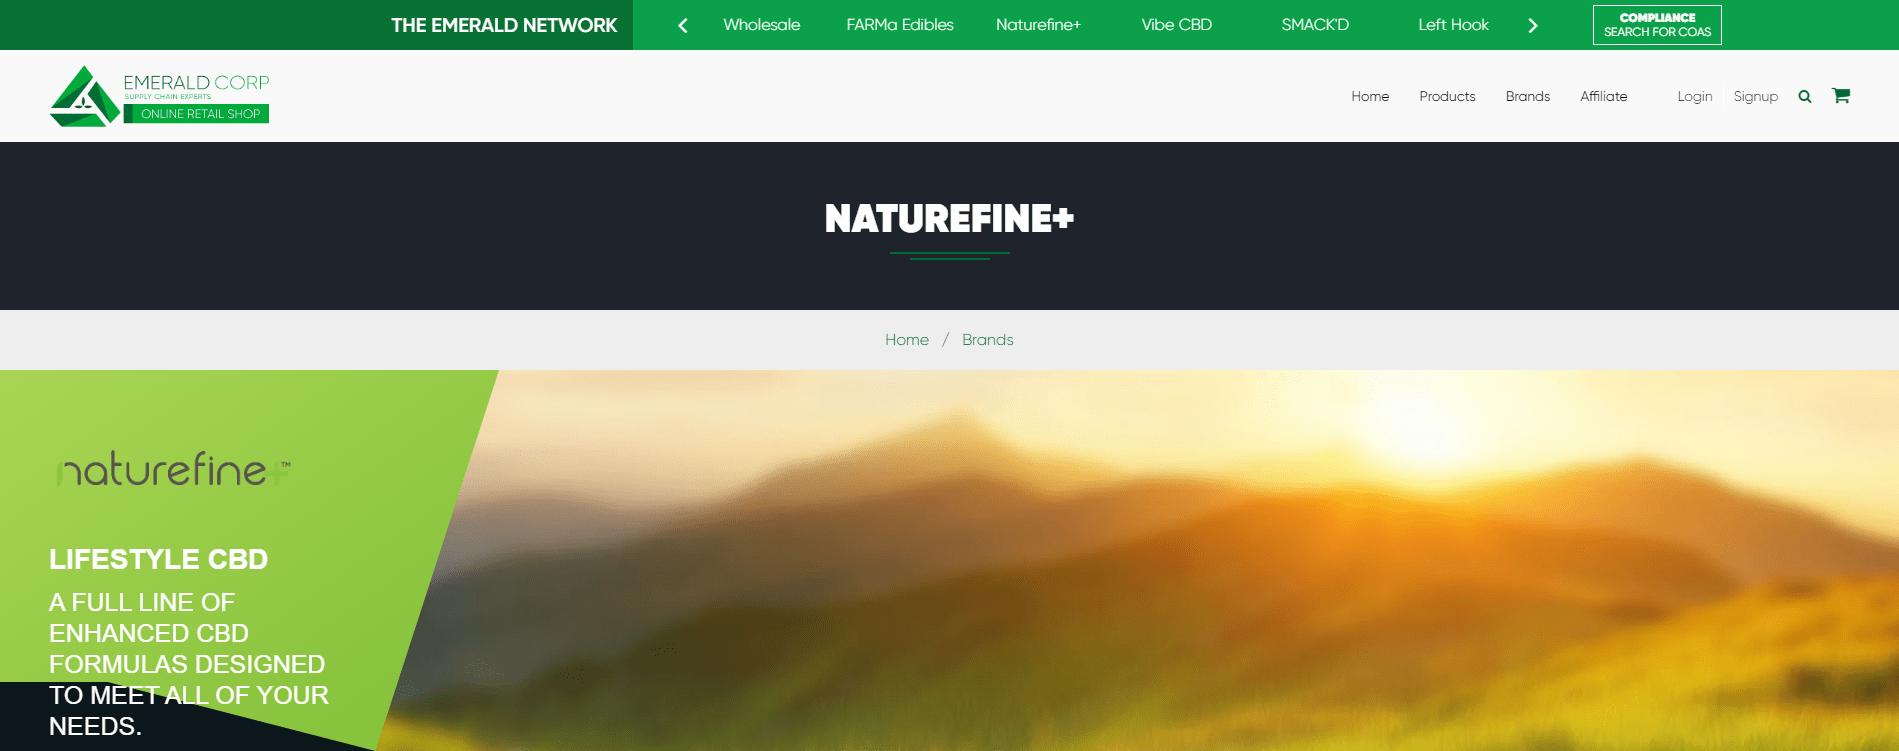 Emerald Network CBD Products